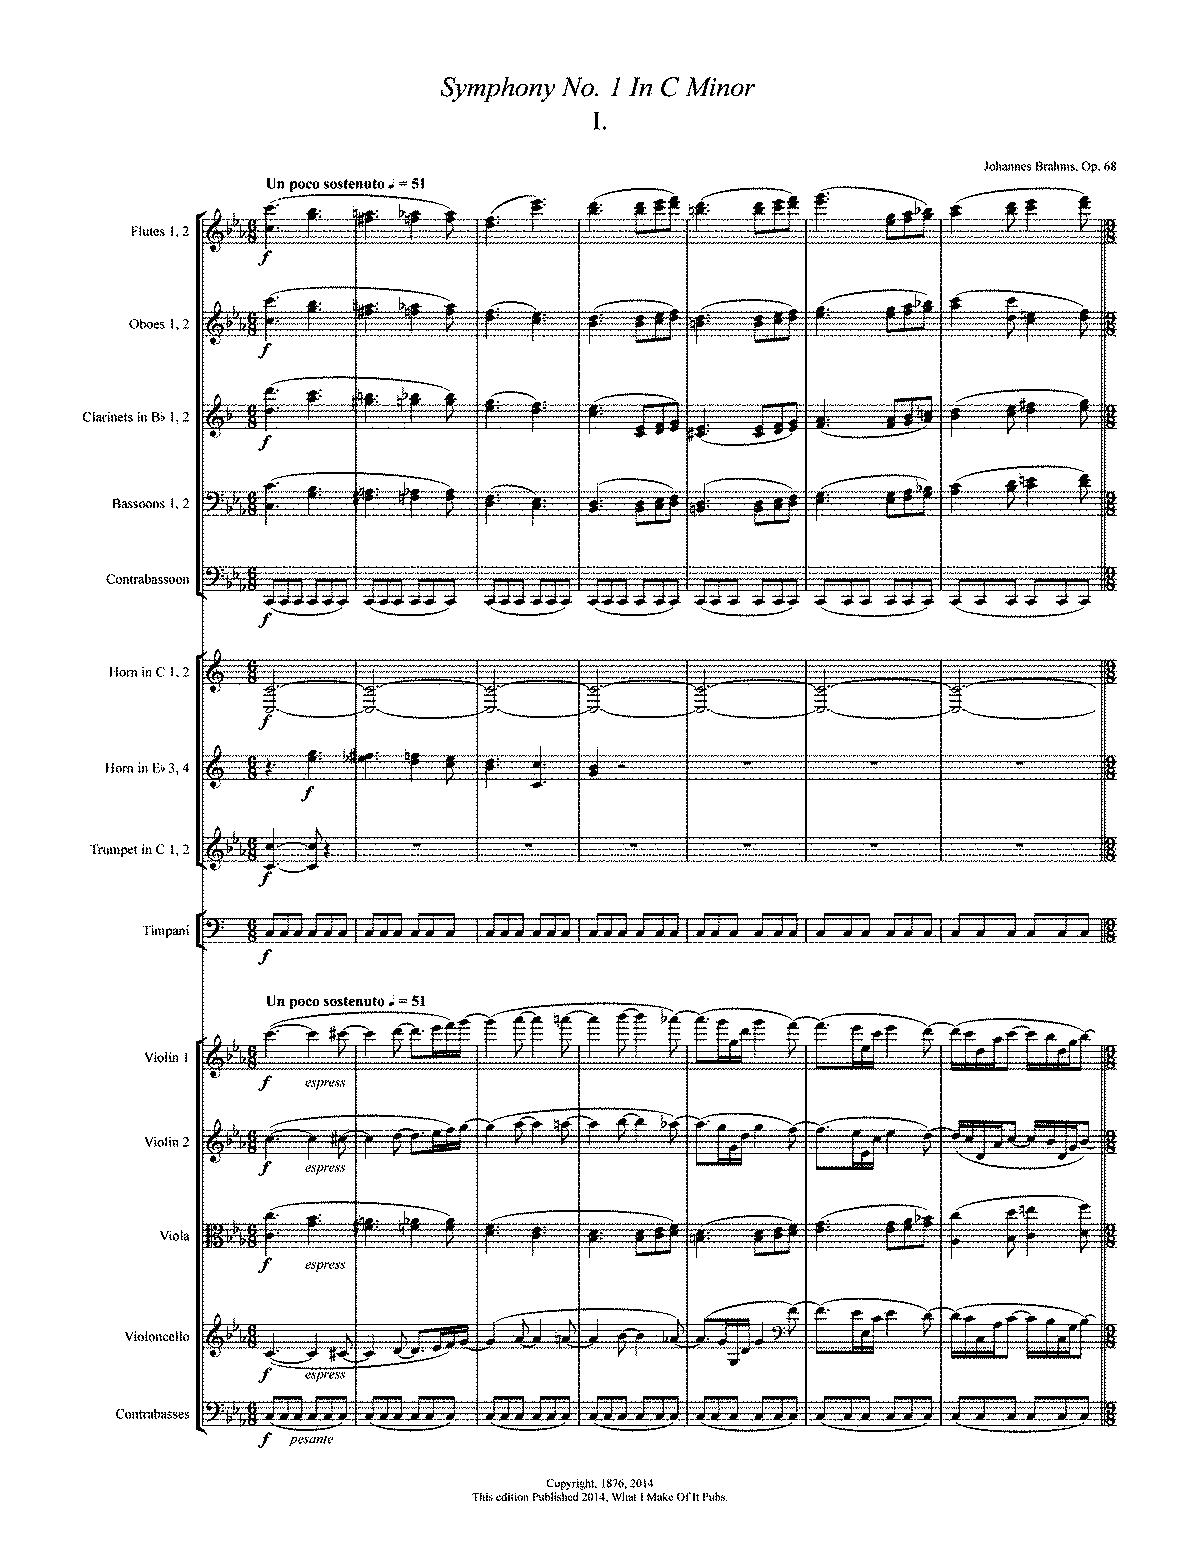 brahms-symphonie-1